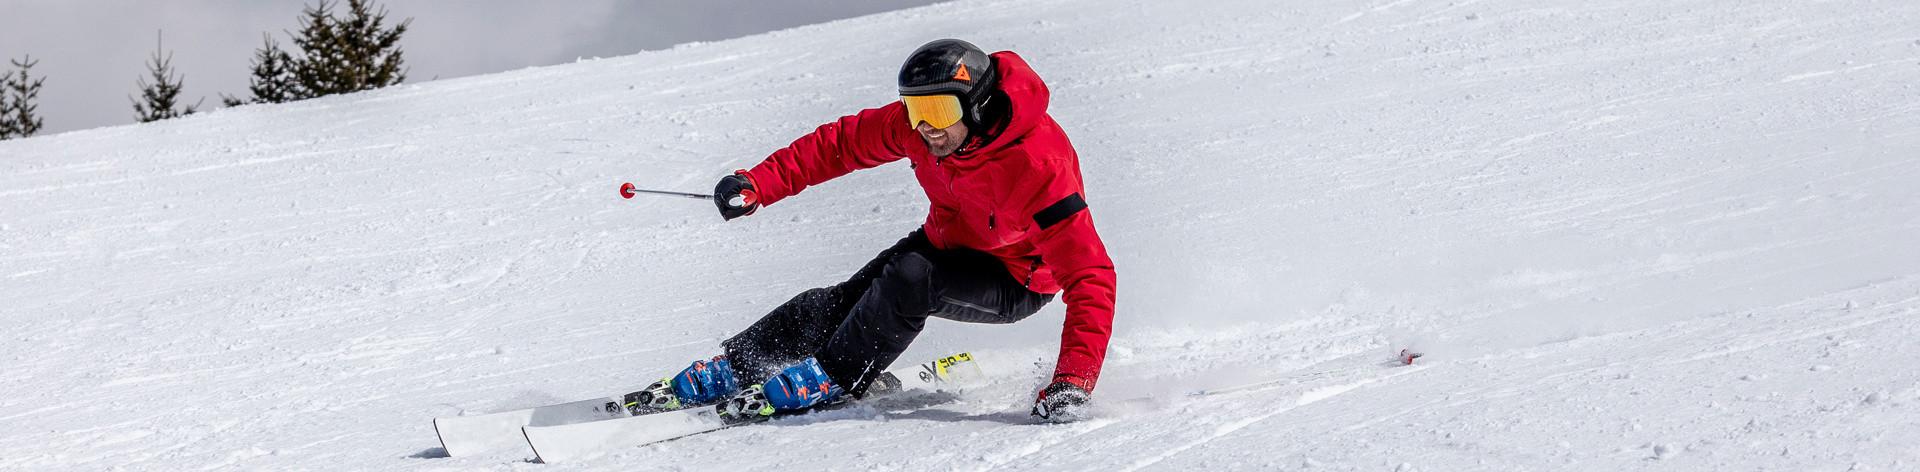 Alpine skiing Downjackets - Dainese Winter